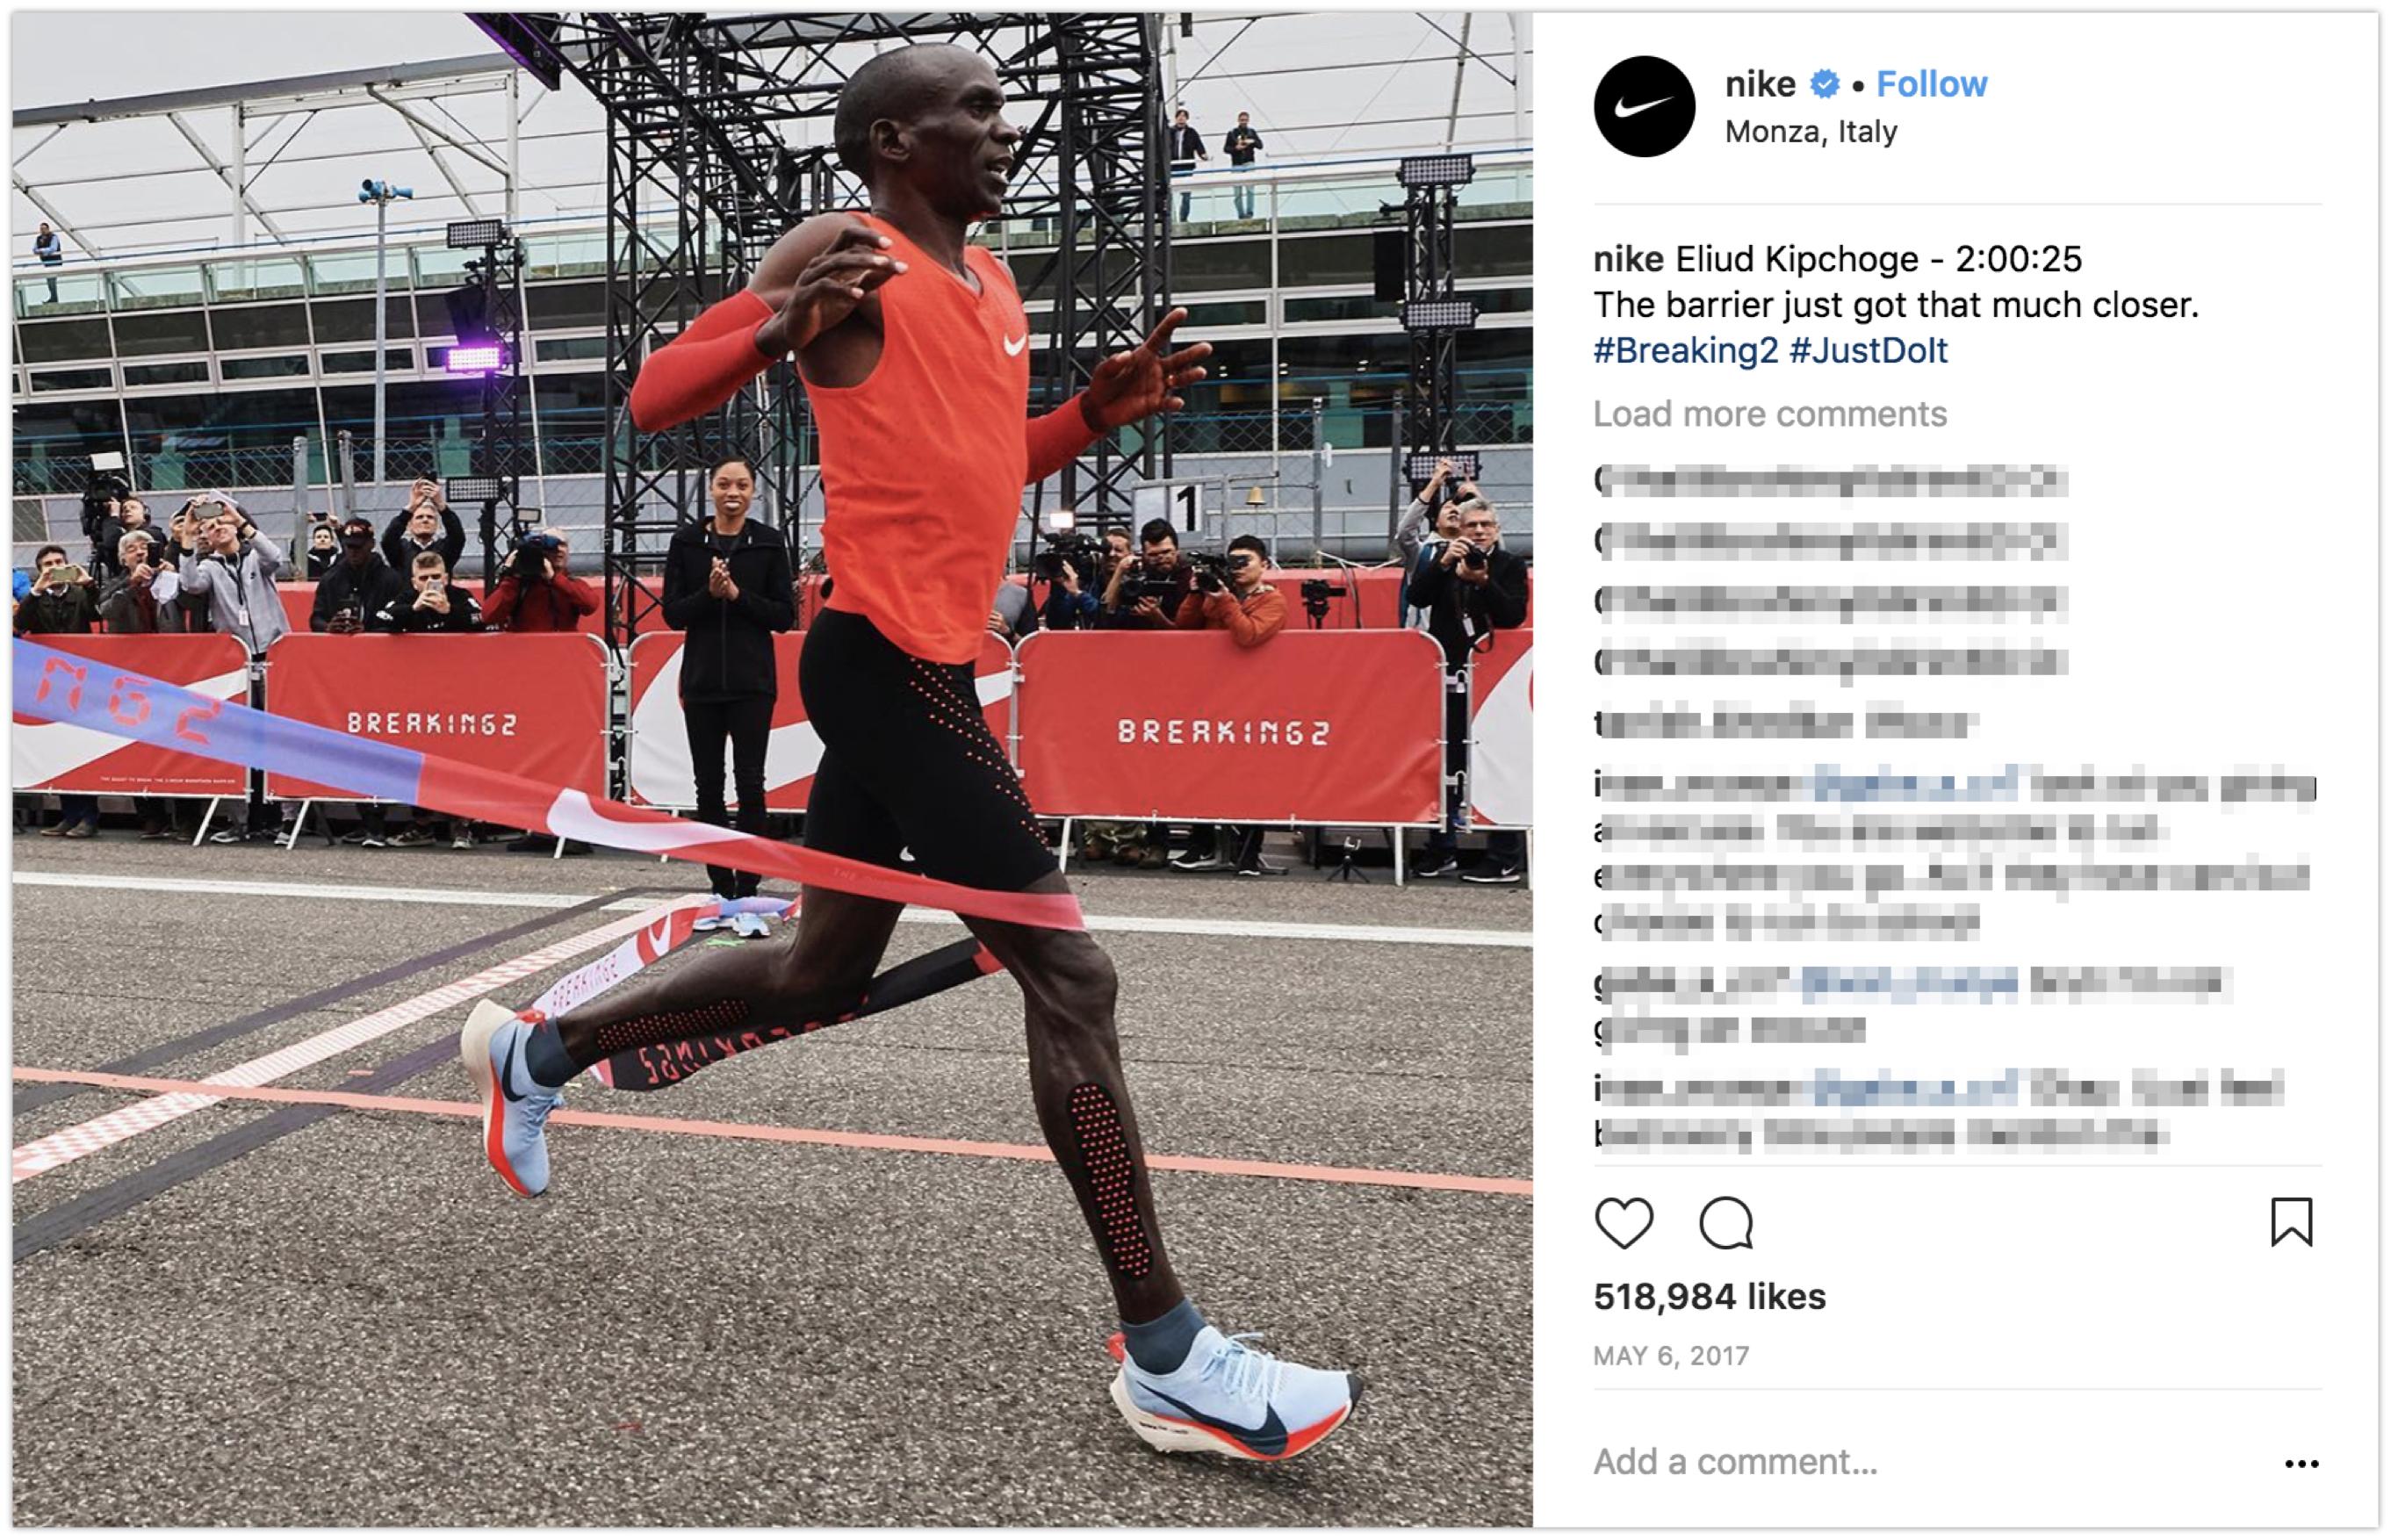 Instagram post from Nike